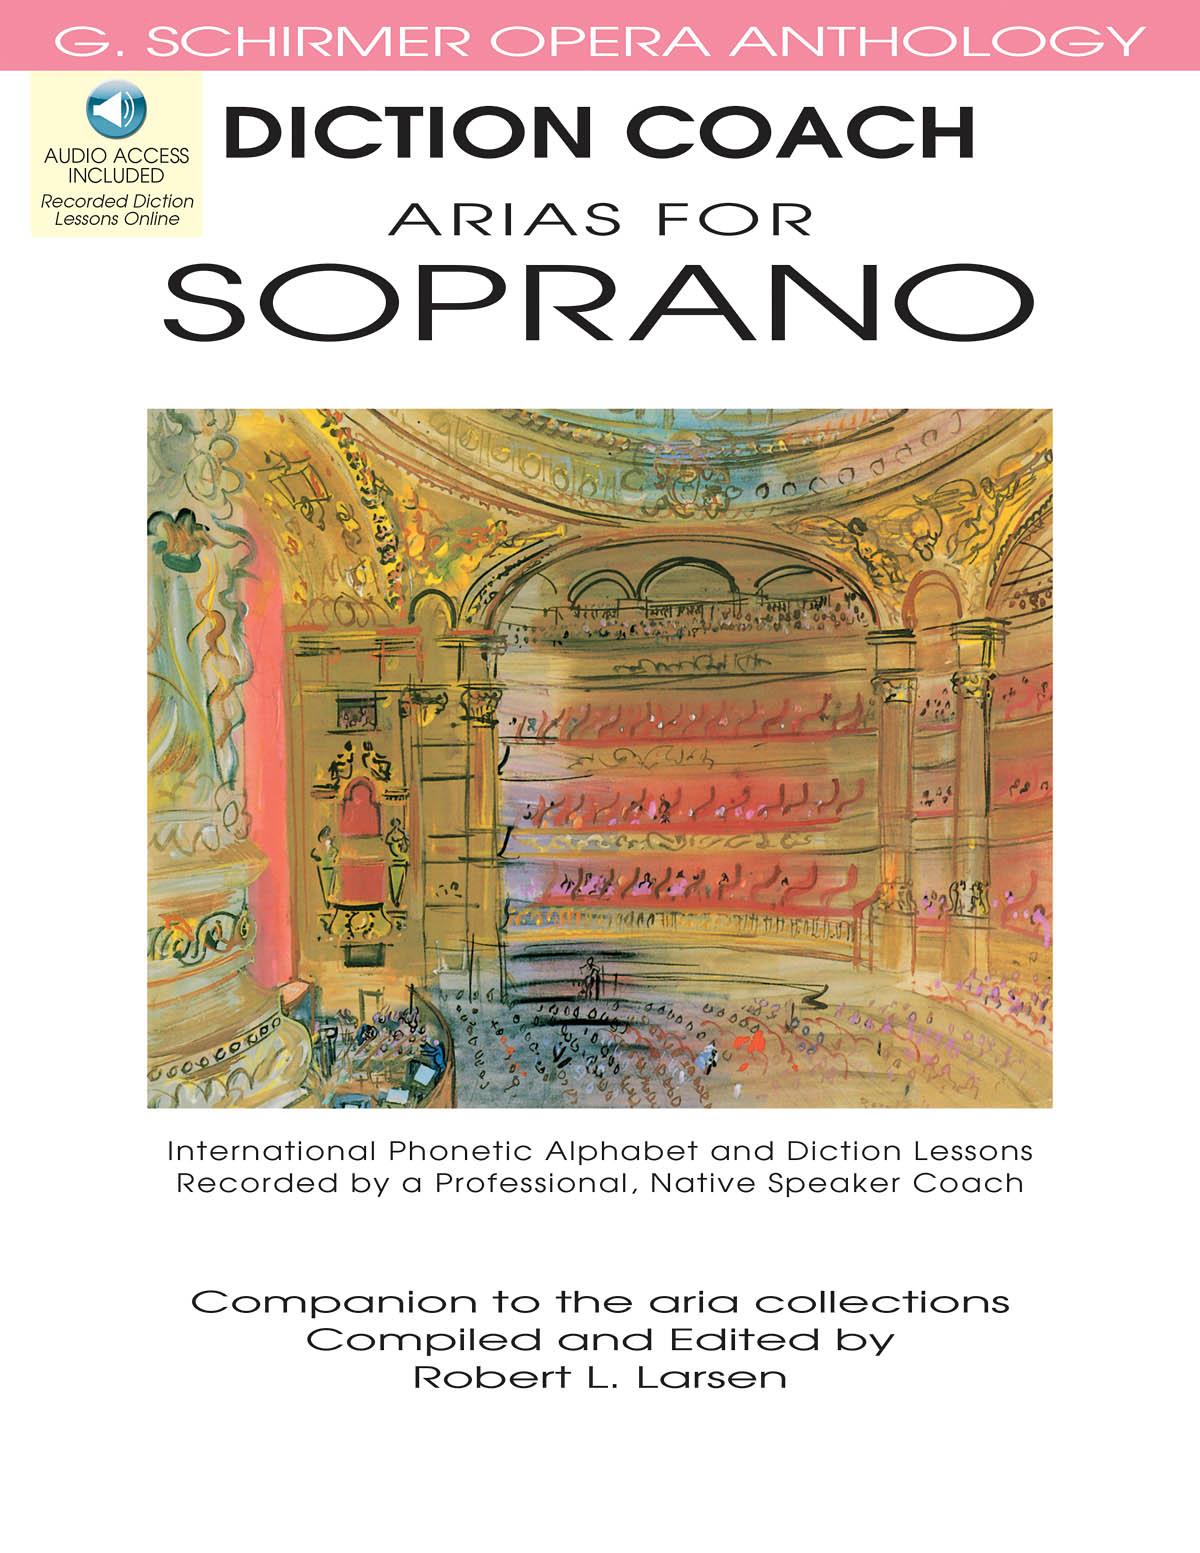 Diction Coach - G. Schirmer Opera Anthology: Soprano: Vocal Work